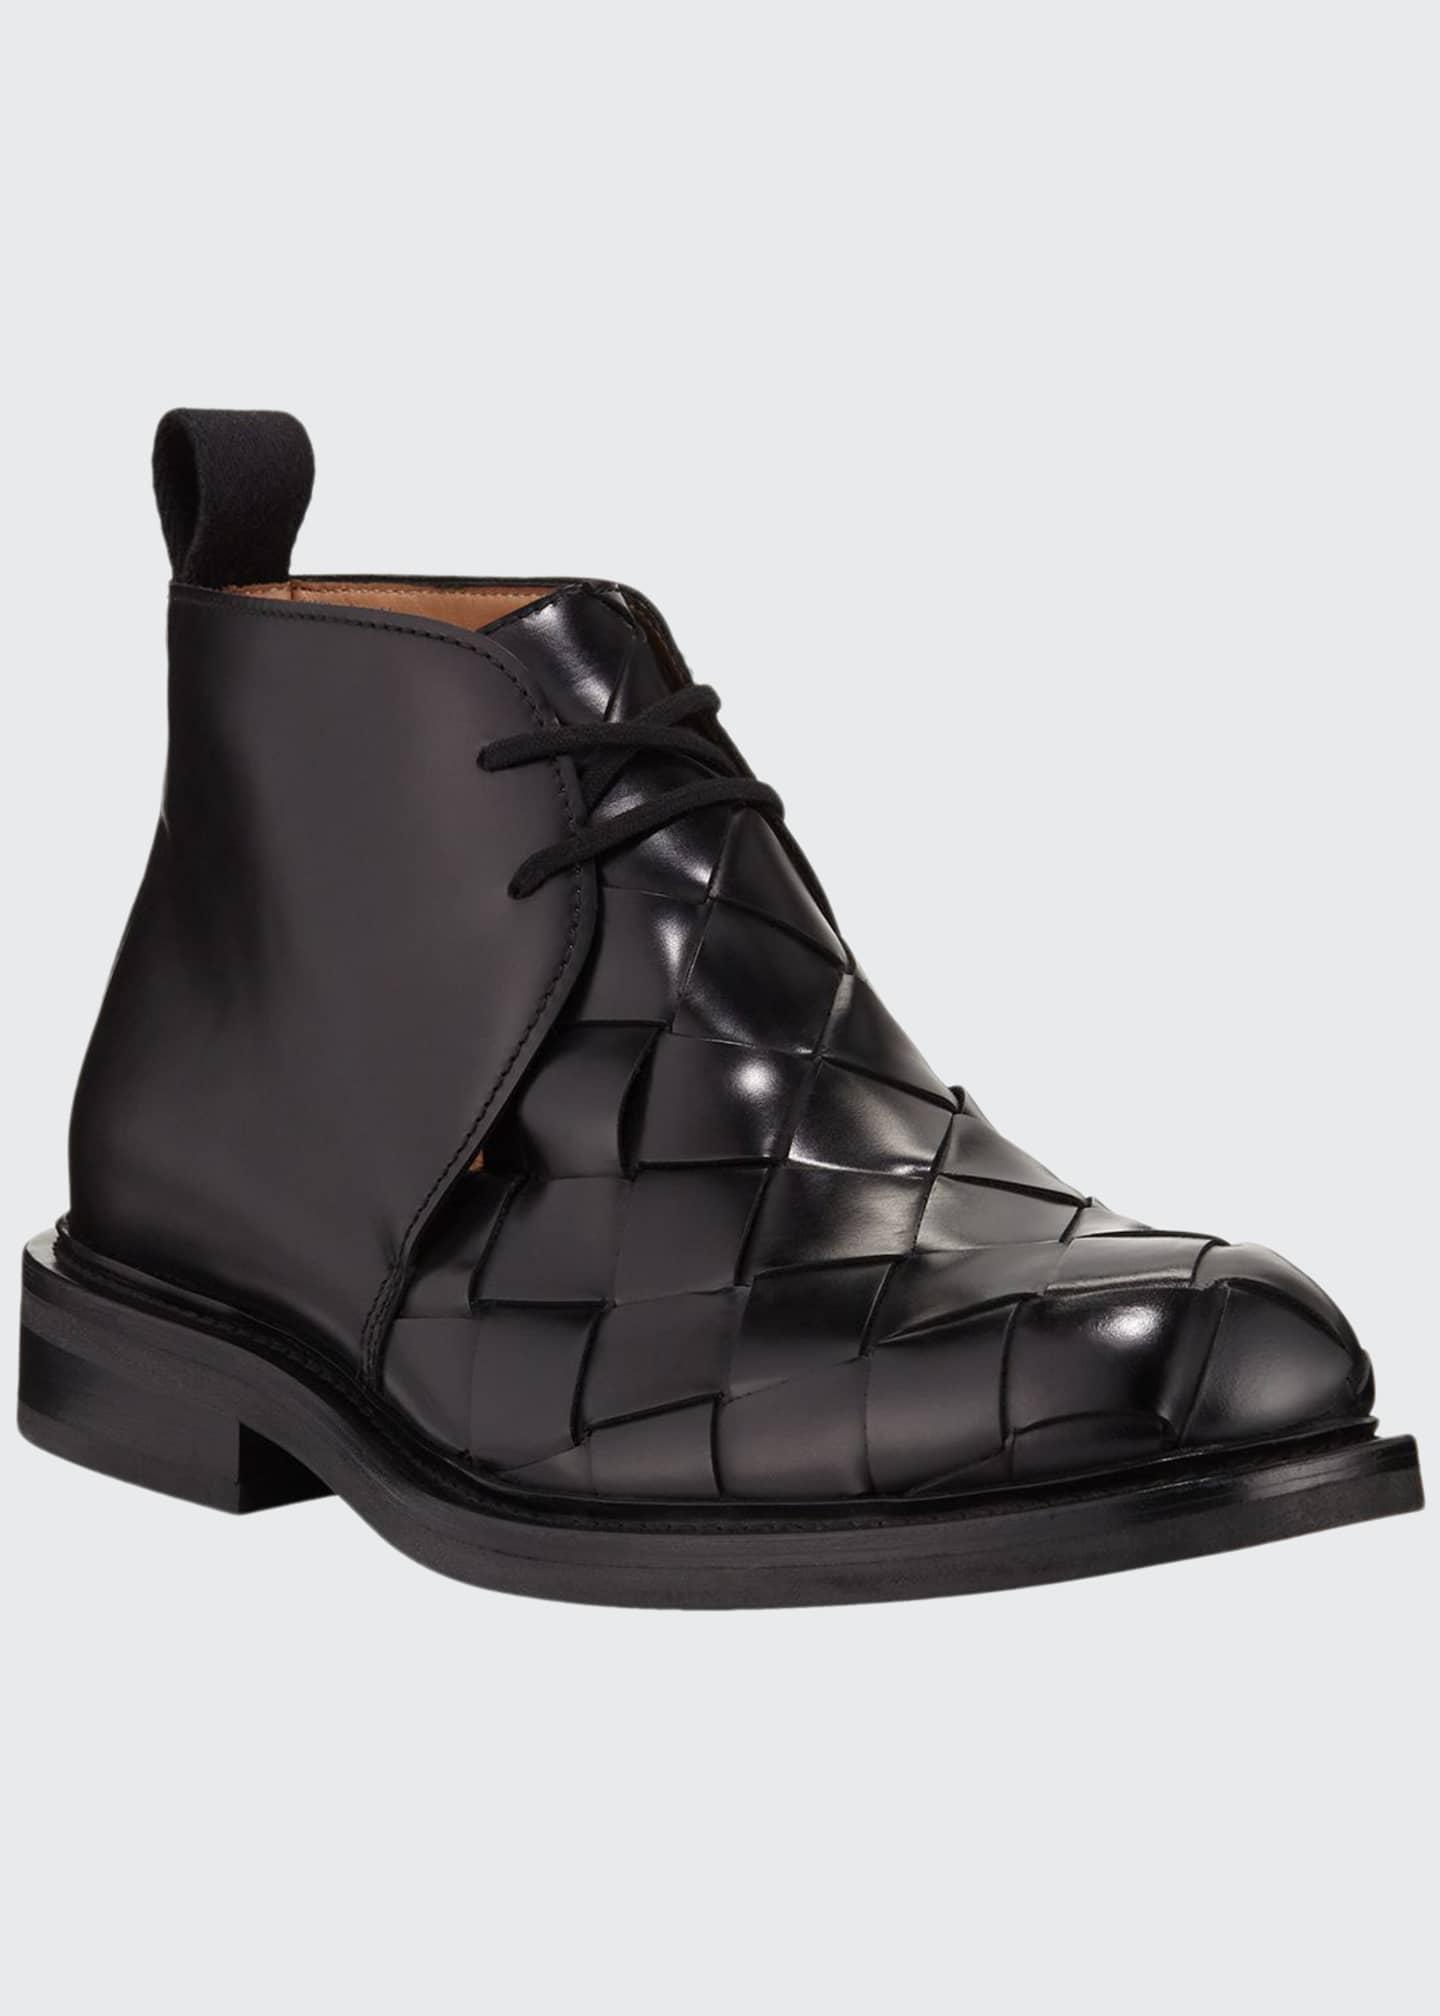 Bottega Veneta Men's Intrecciato Woven Leather Chukka Boots